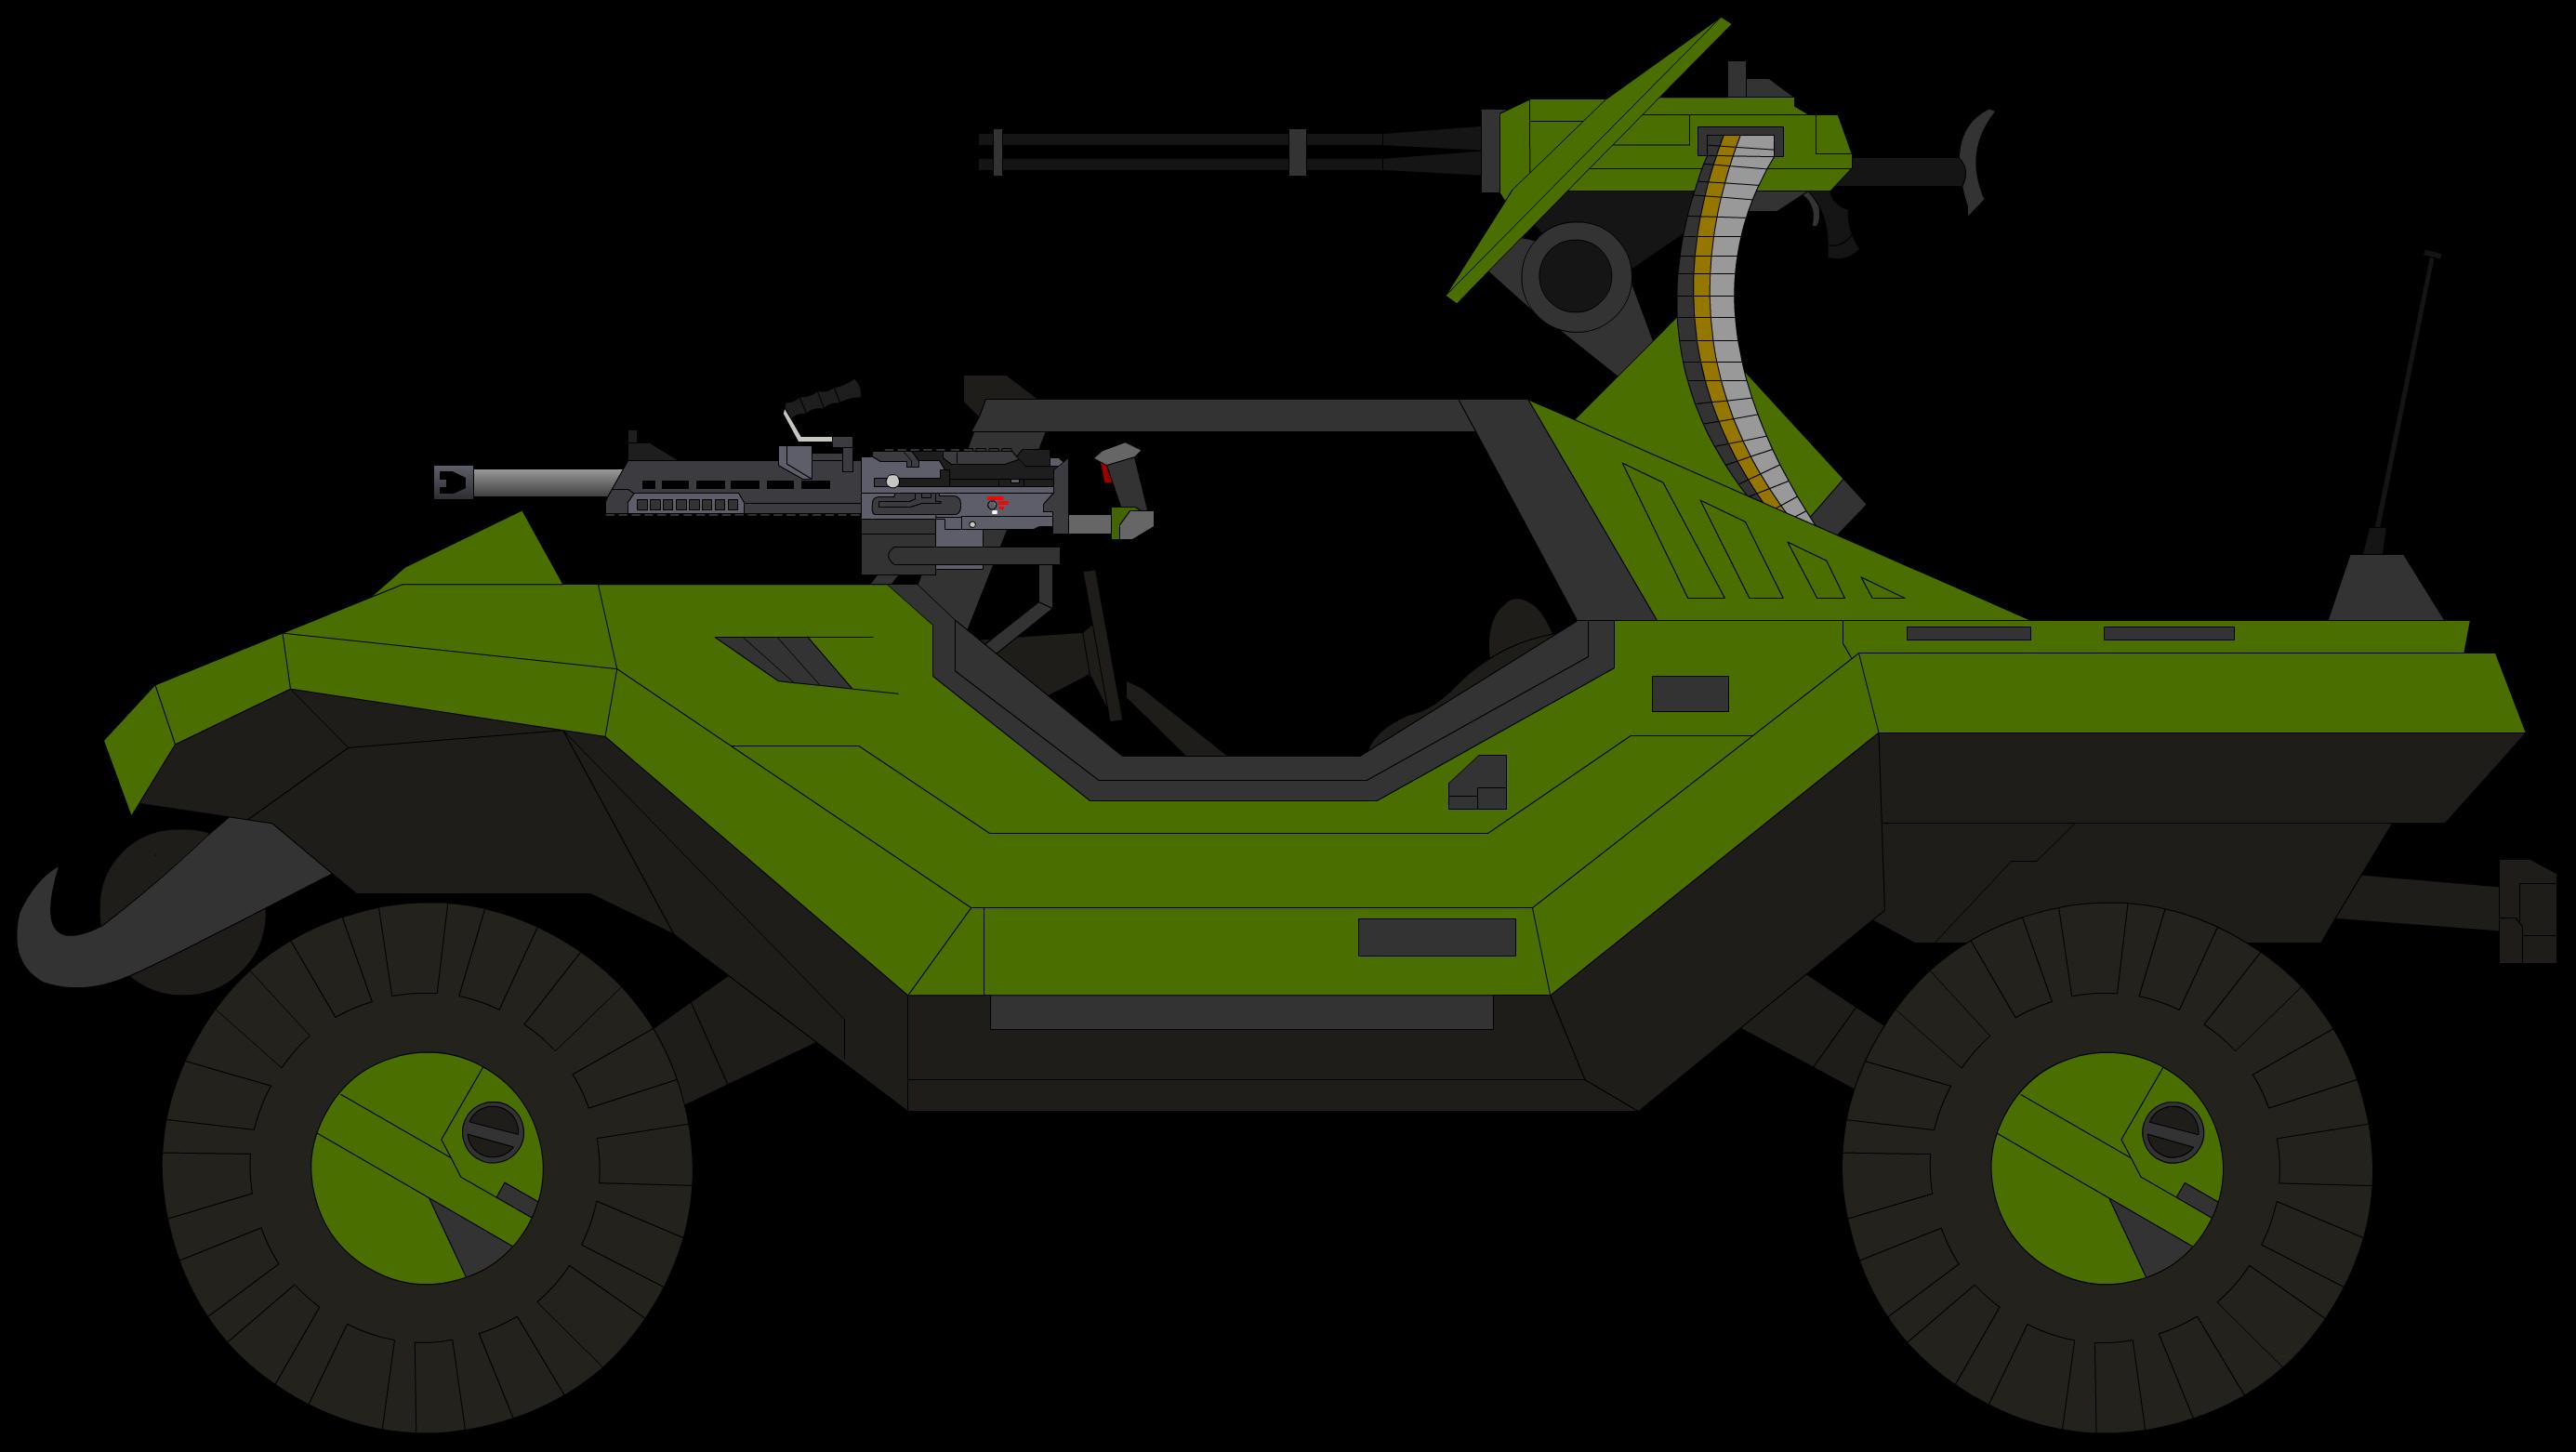 M12C4 Warthog Assassin Rapid Assault Vehicle